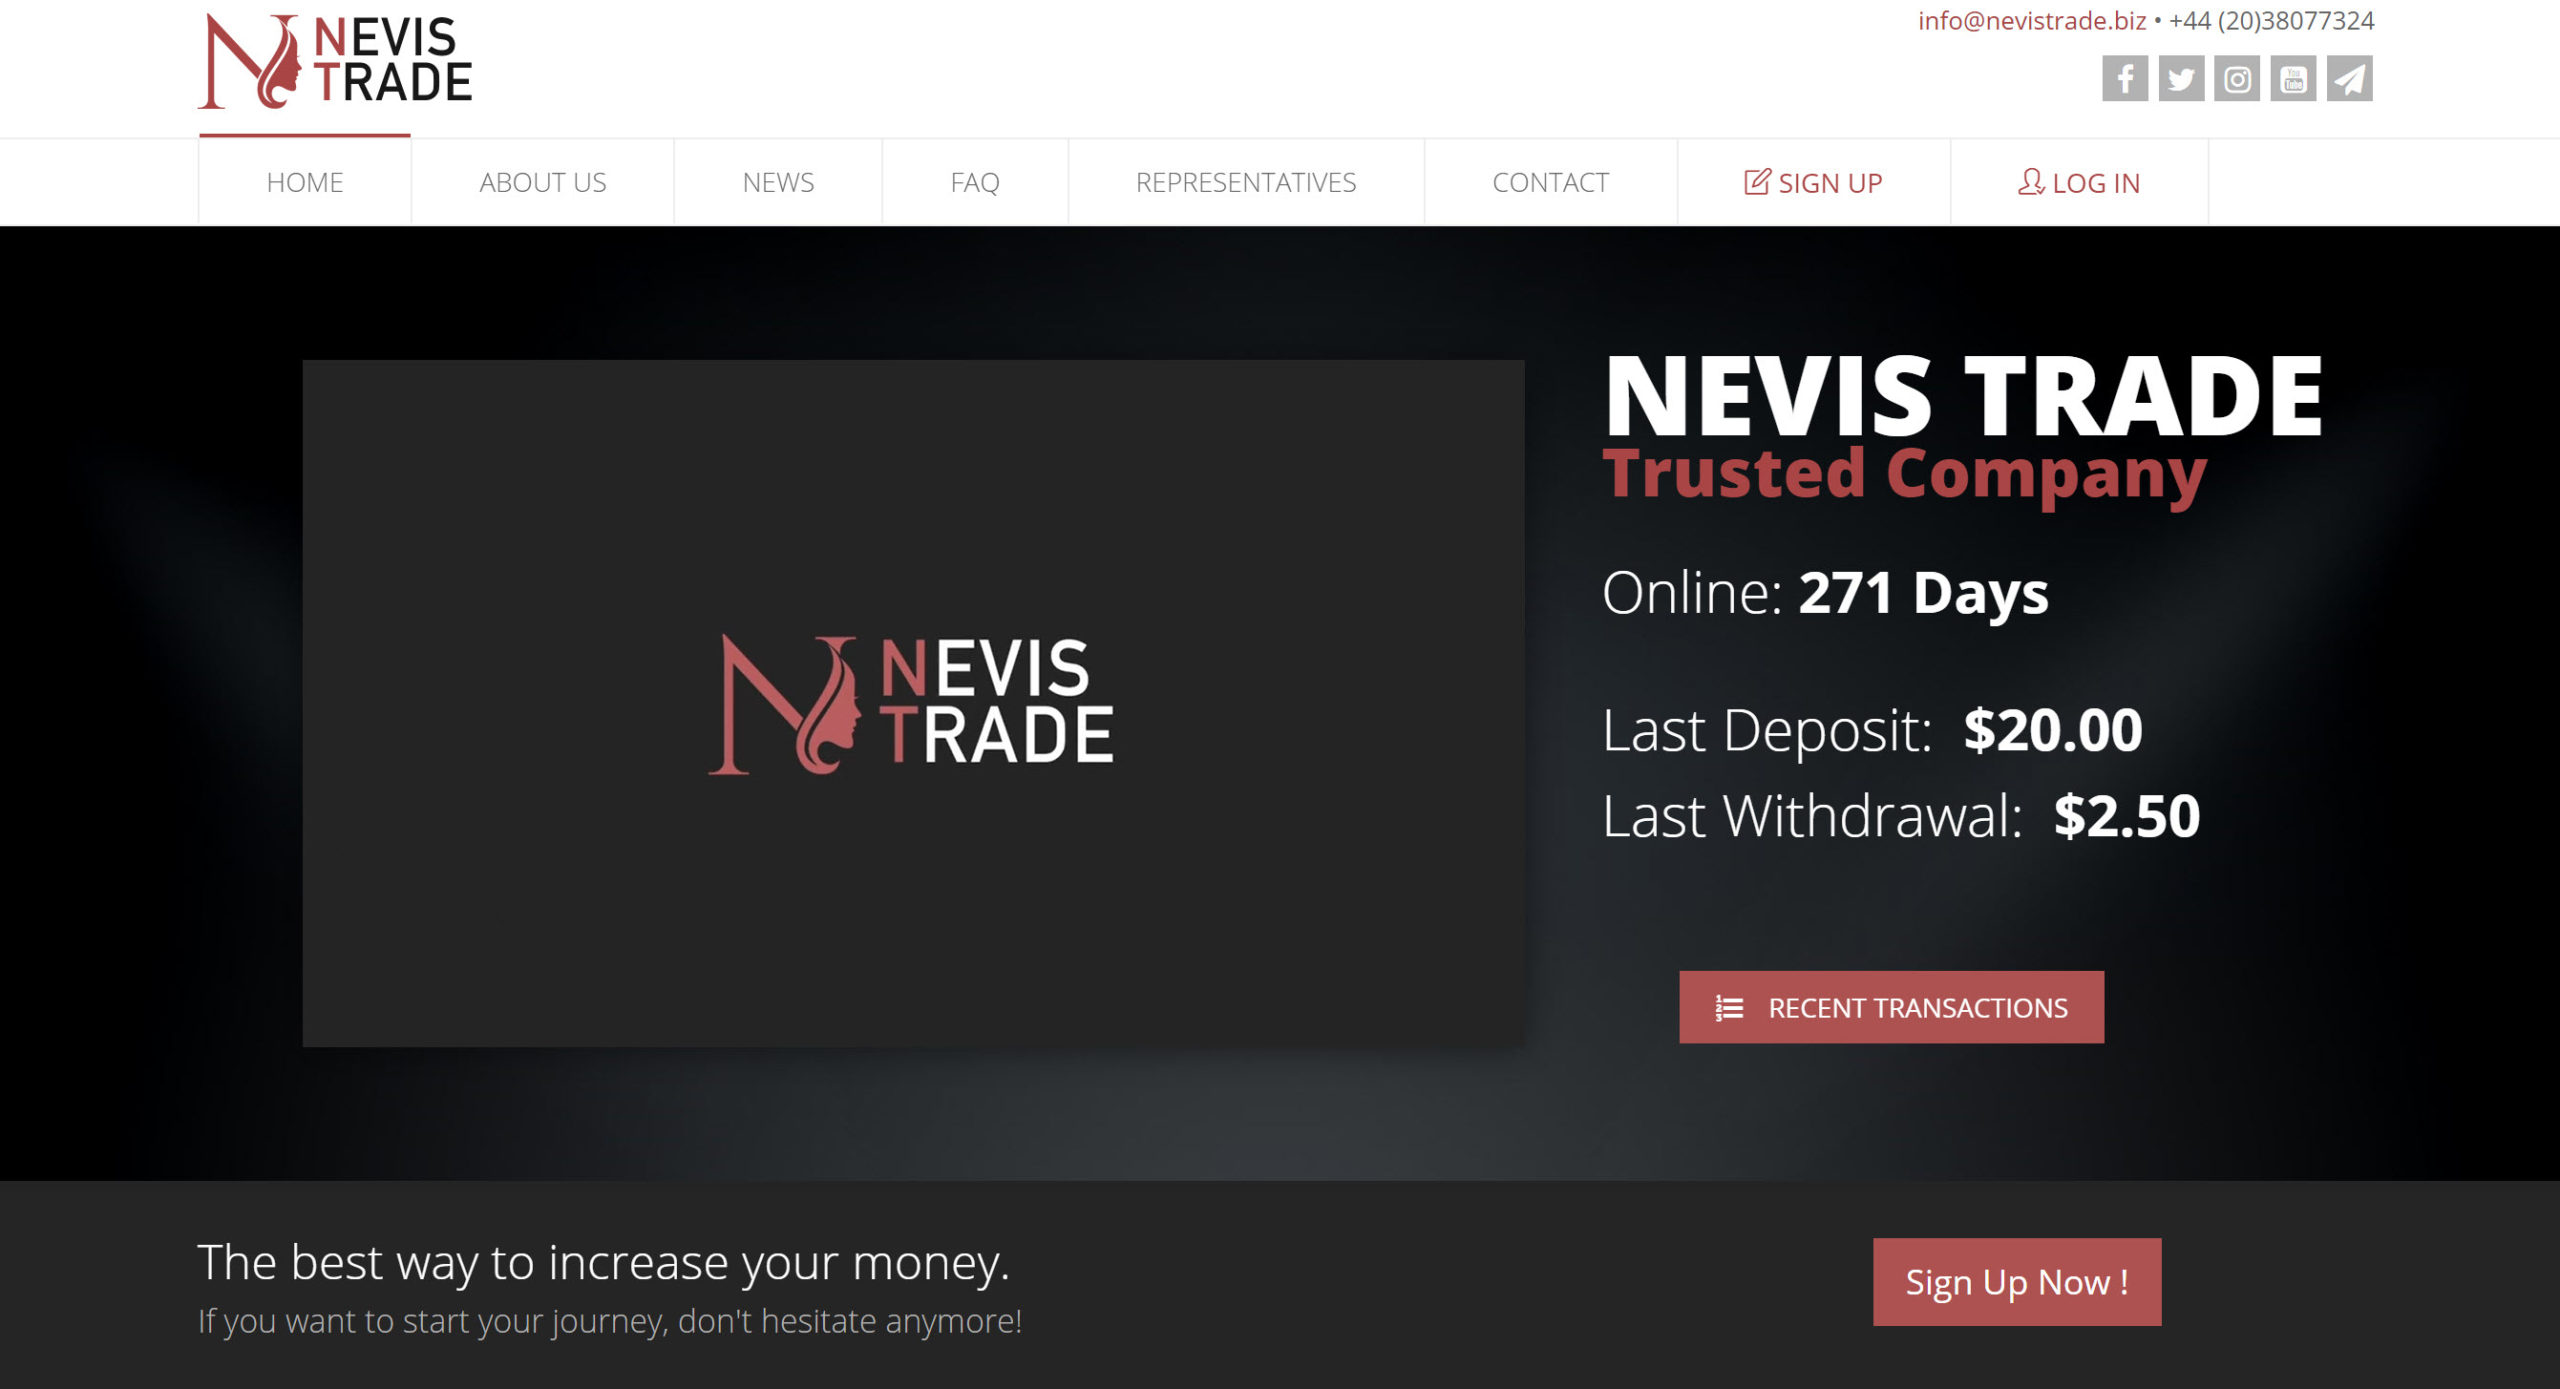 Nevis Trade